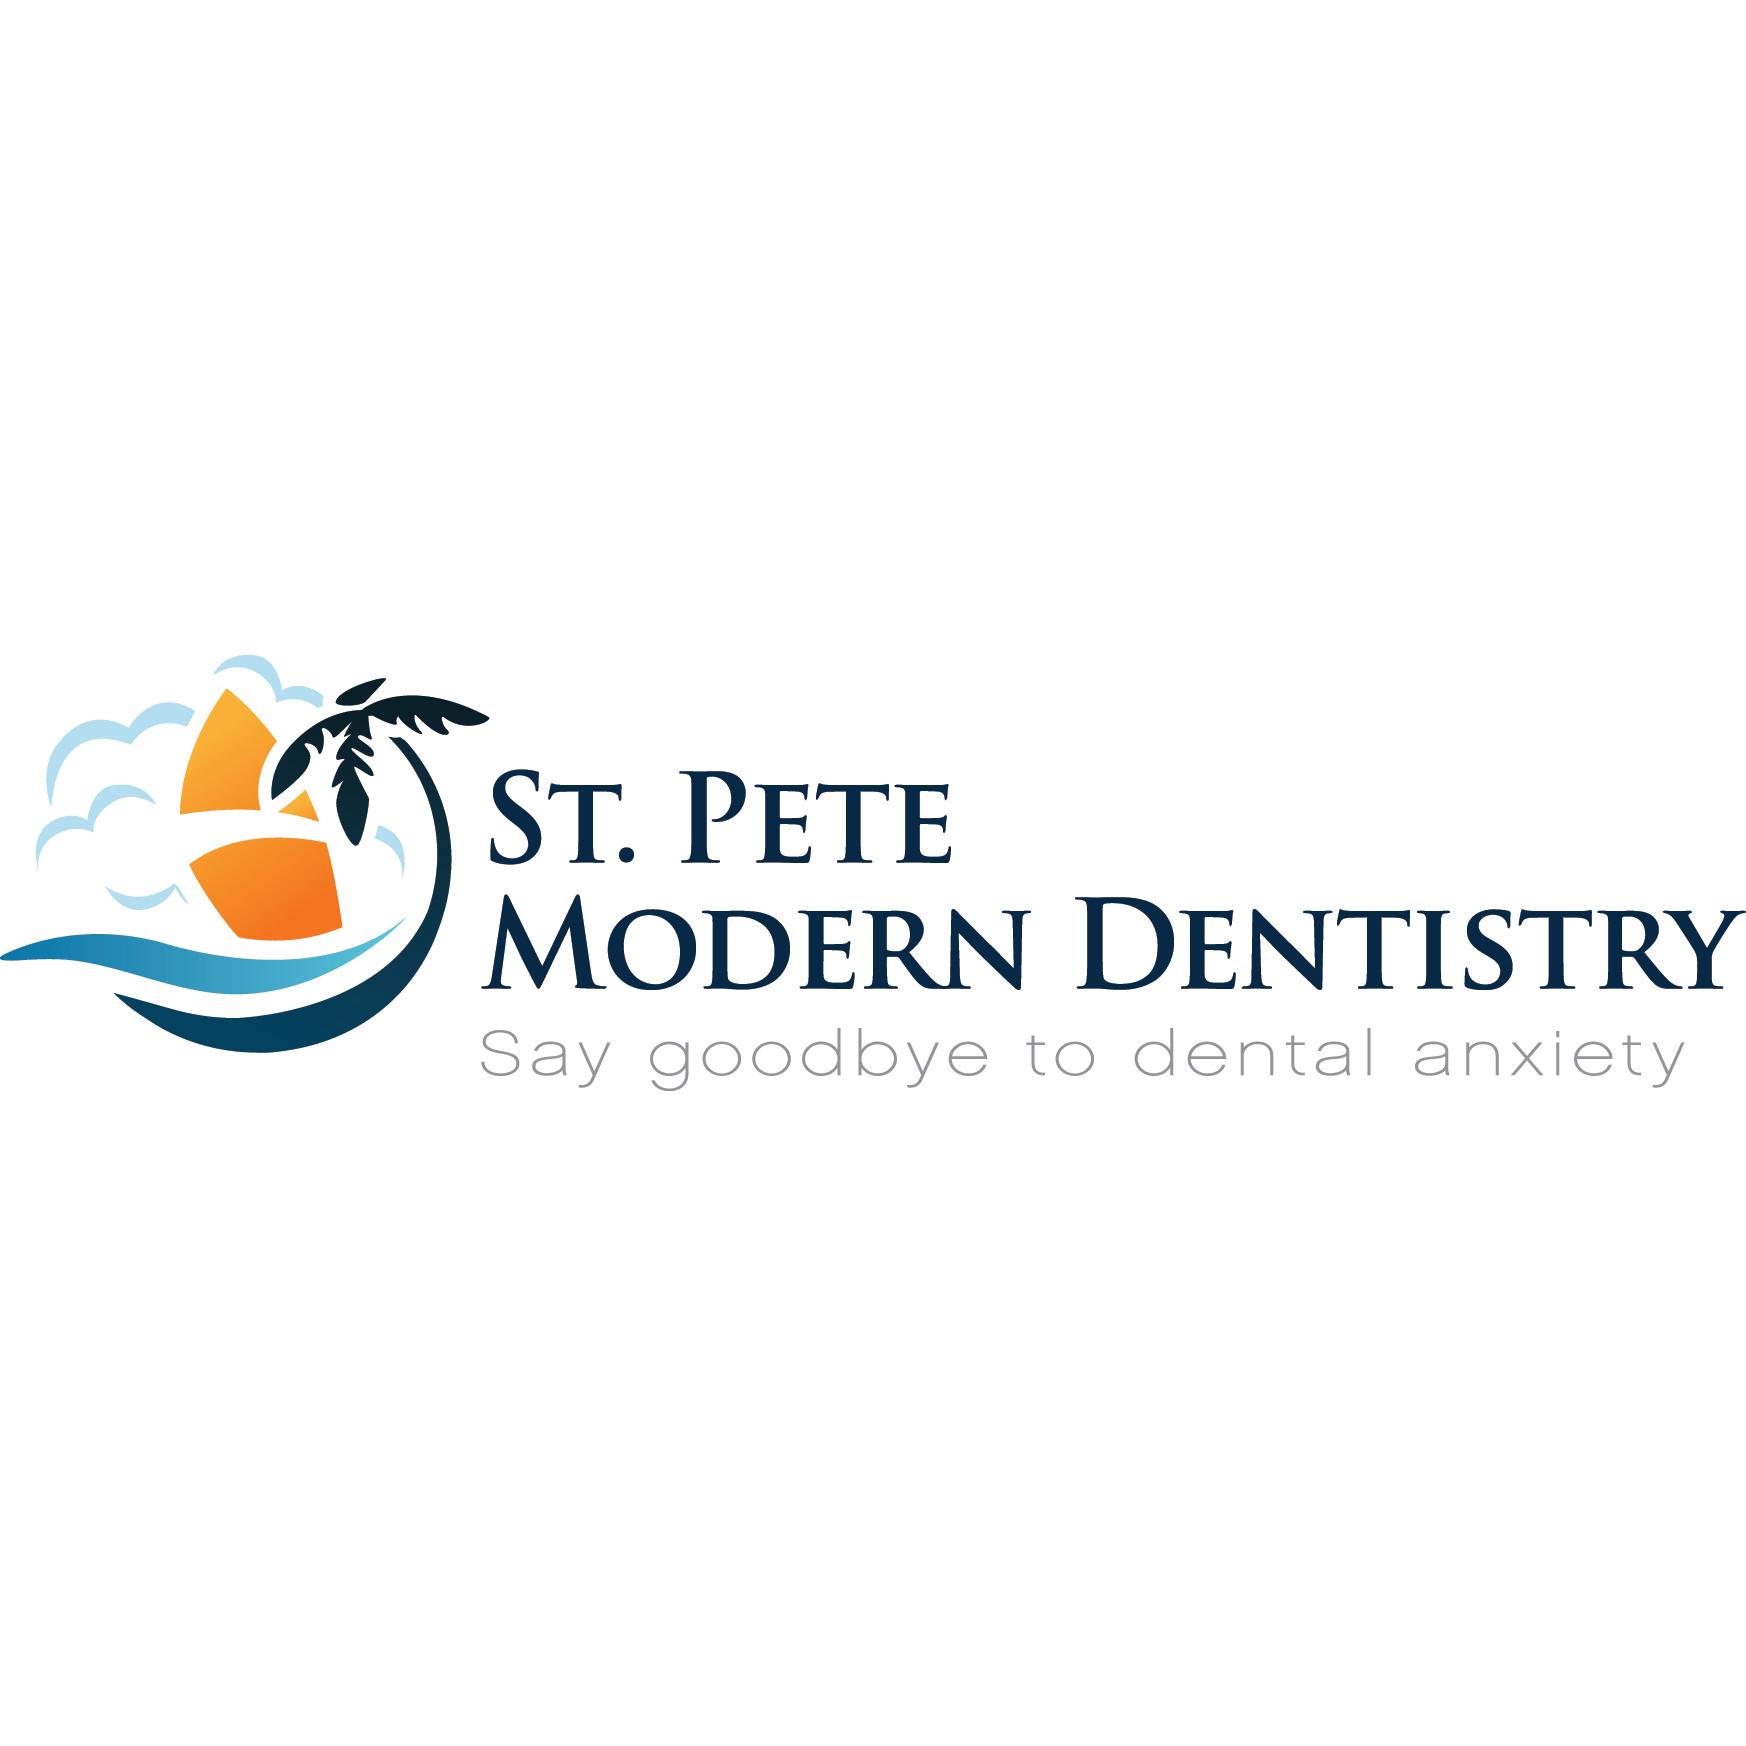 St. Pete Modern Dentistry